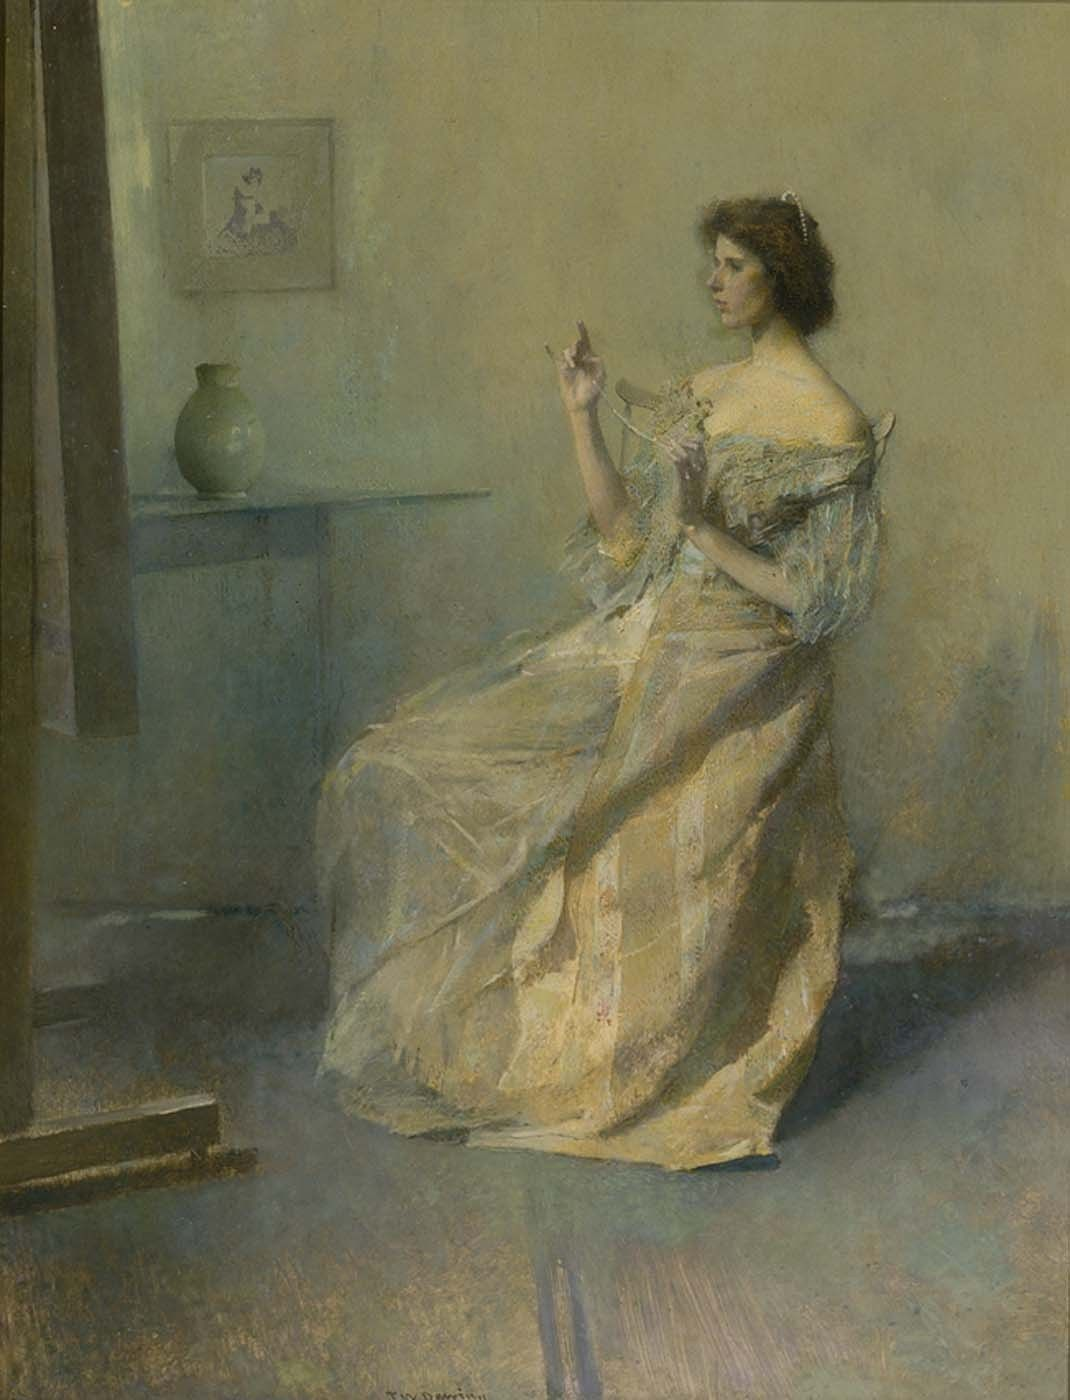 Thomas Wilmer Dewing – American Impressionist at American Museum | American Art Museum